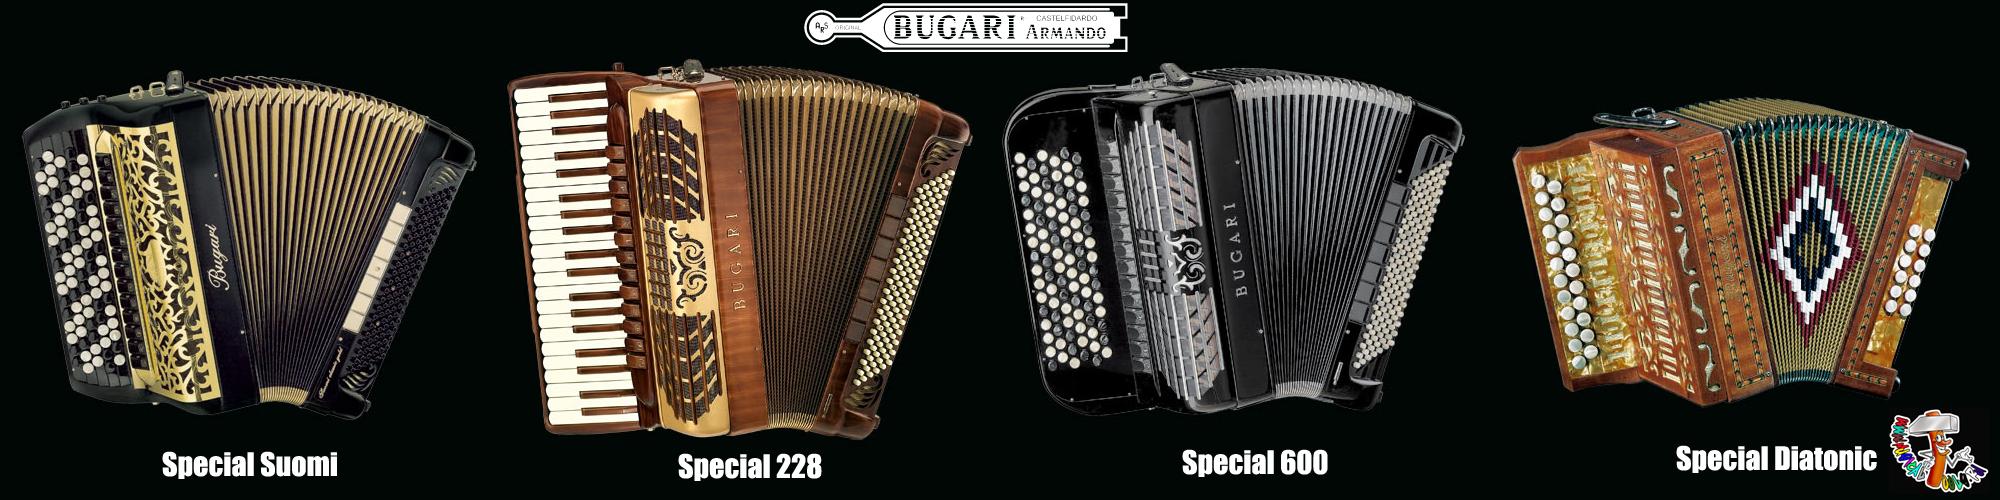 Bugari Armando Special Series